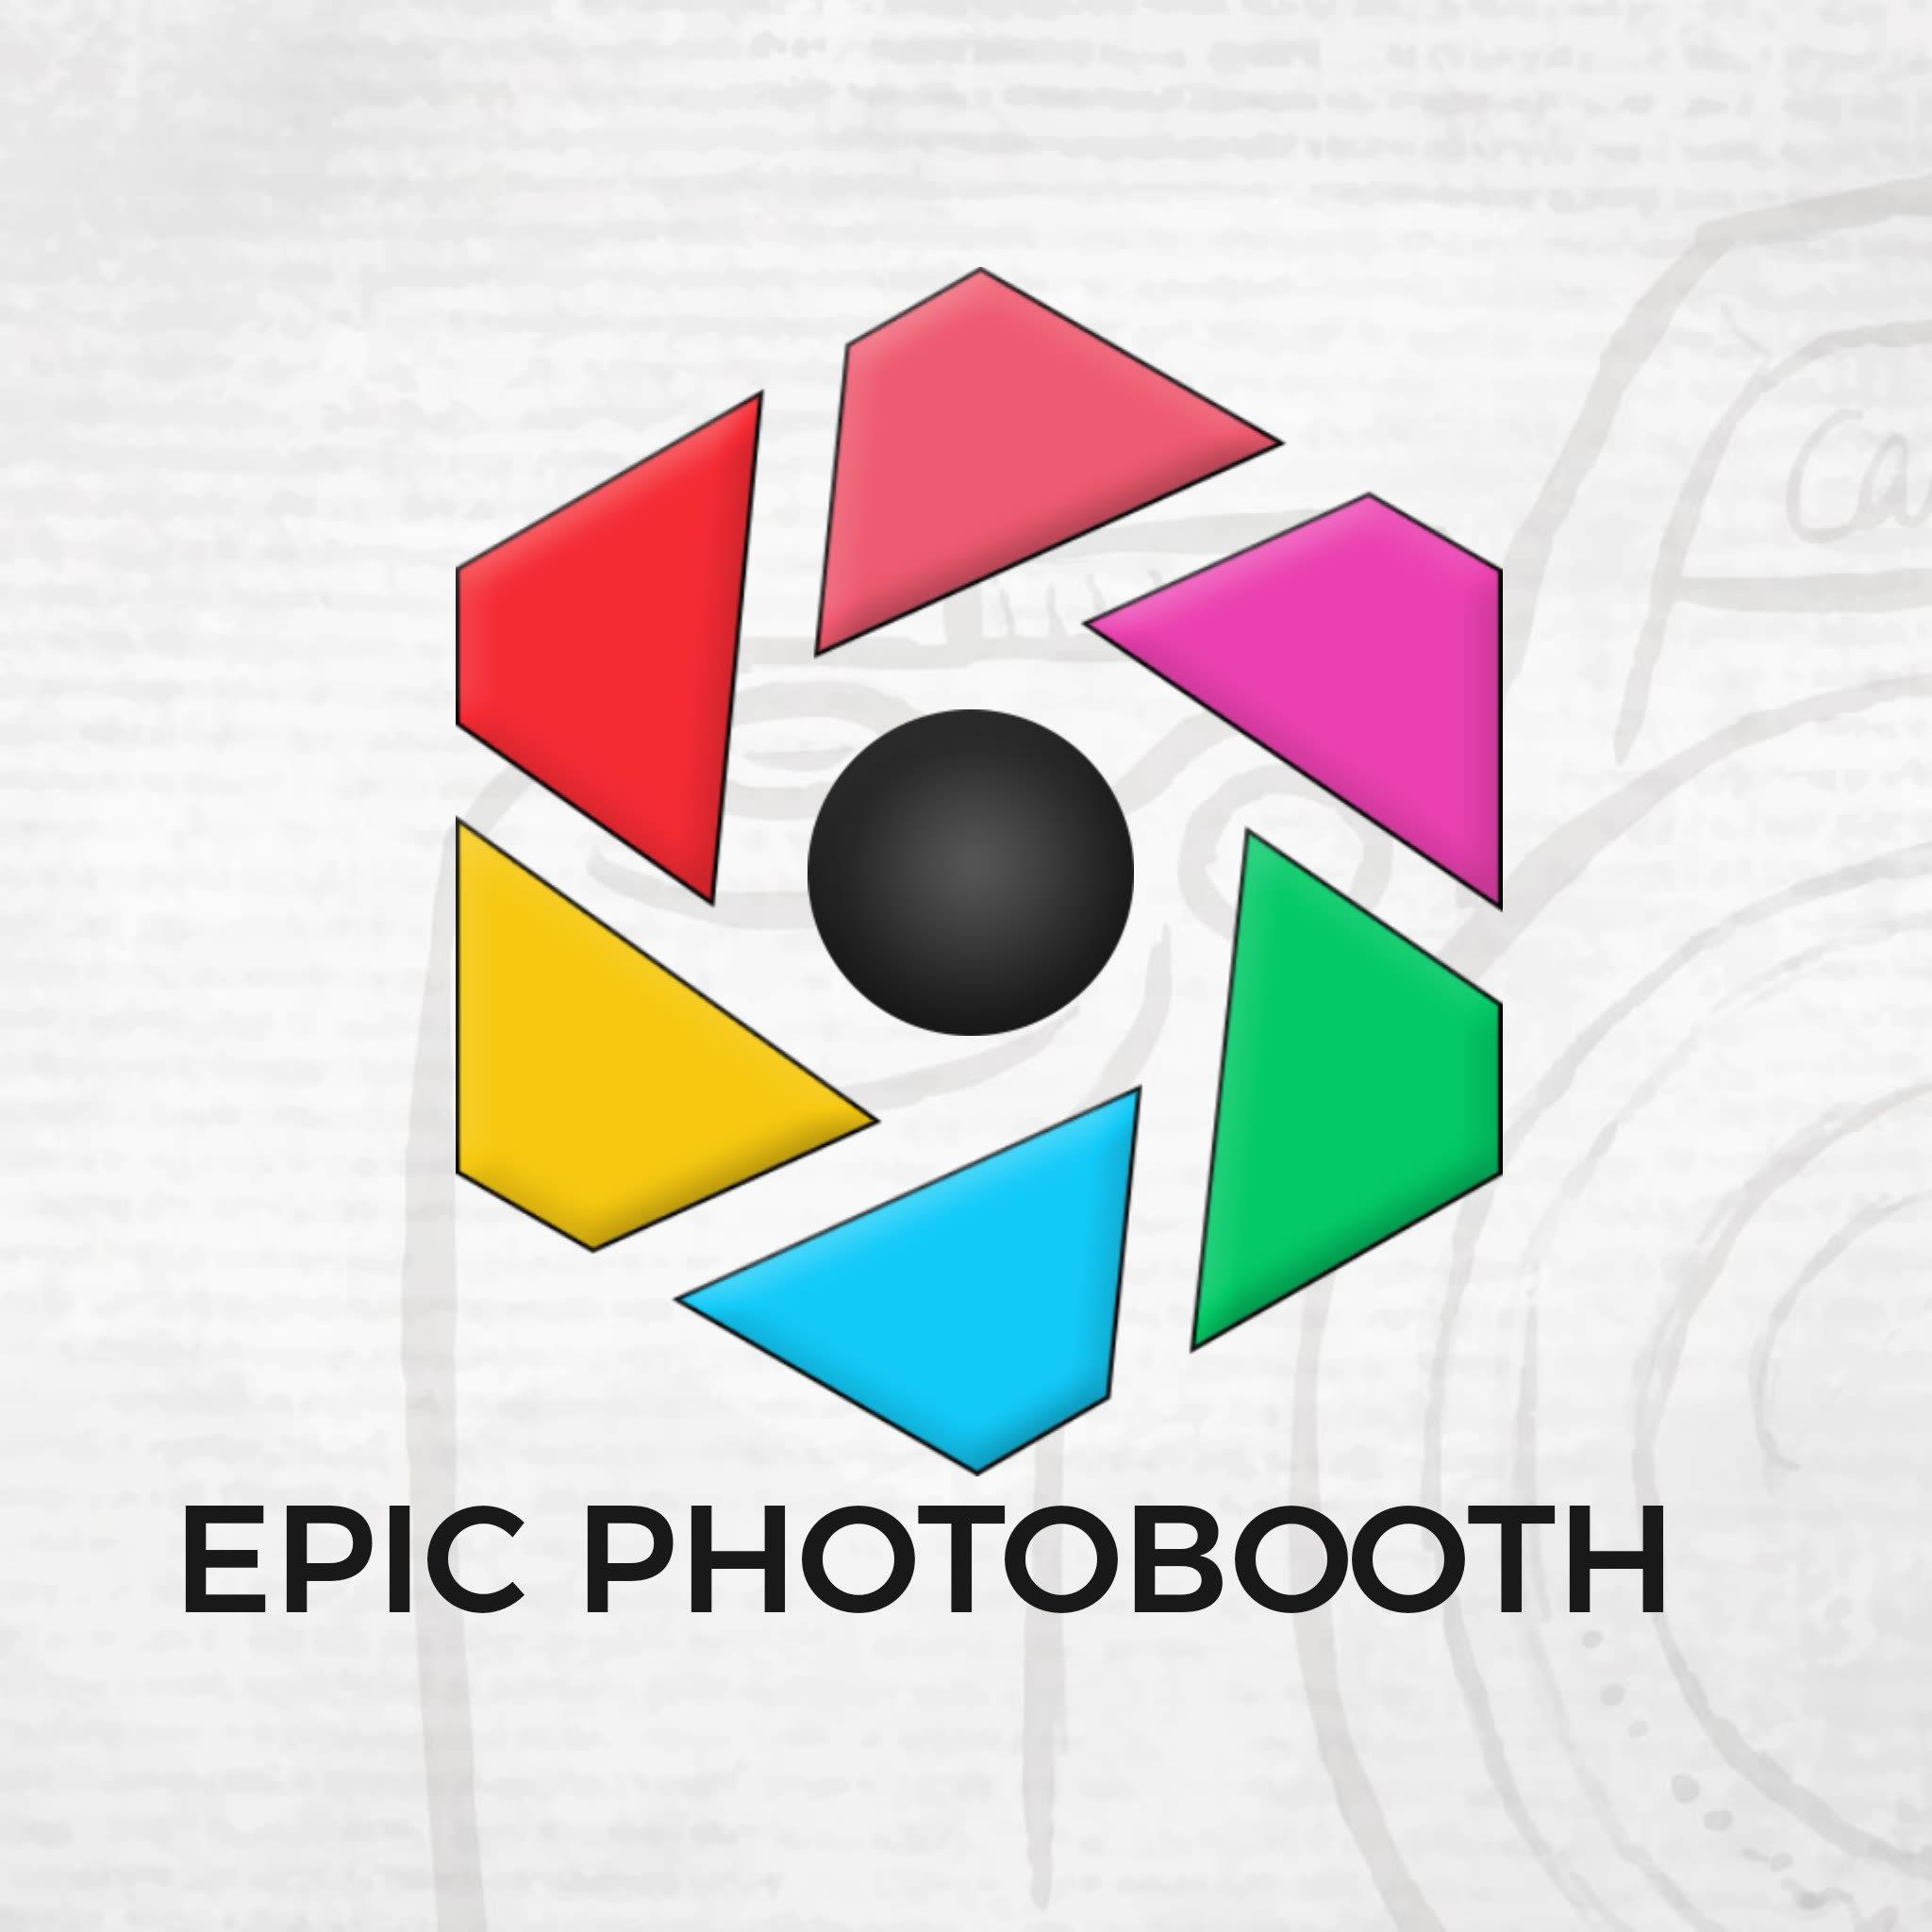 Epic Photobooth